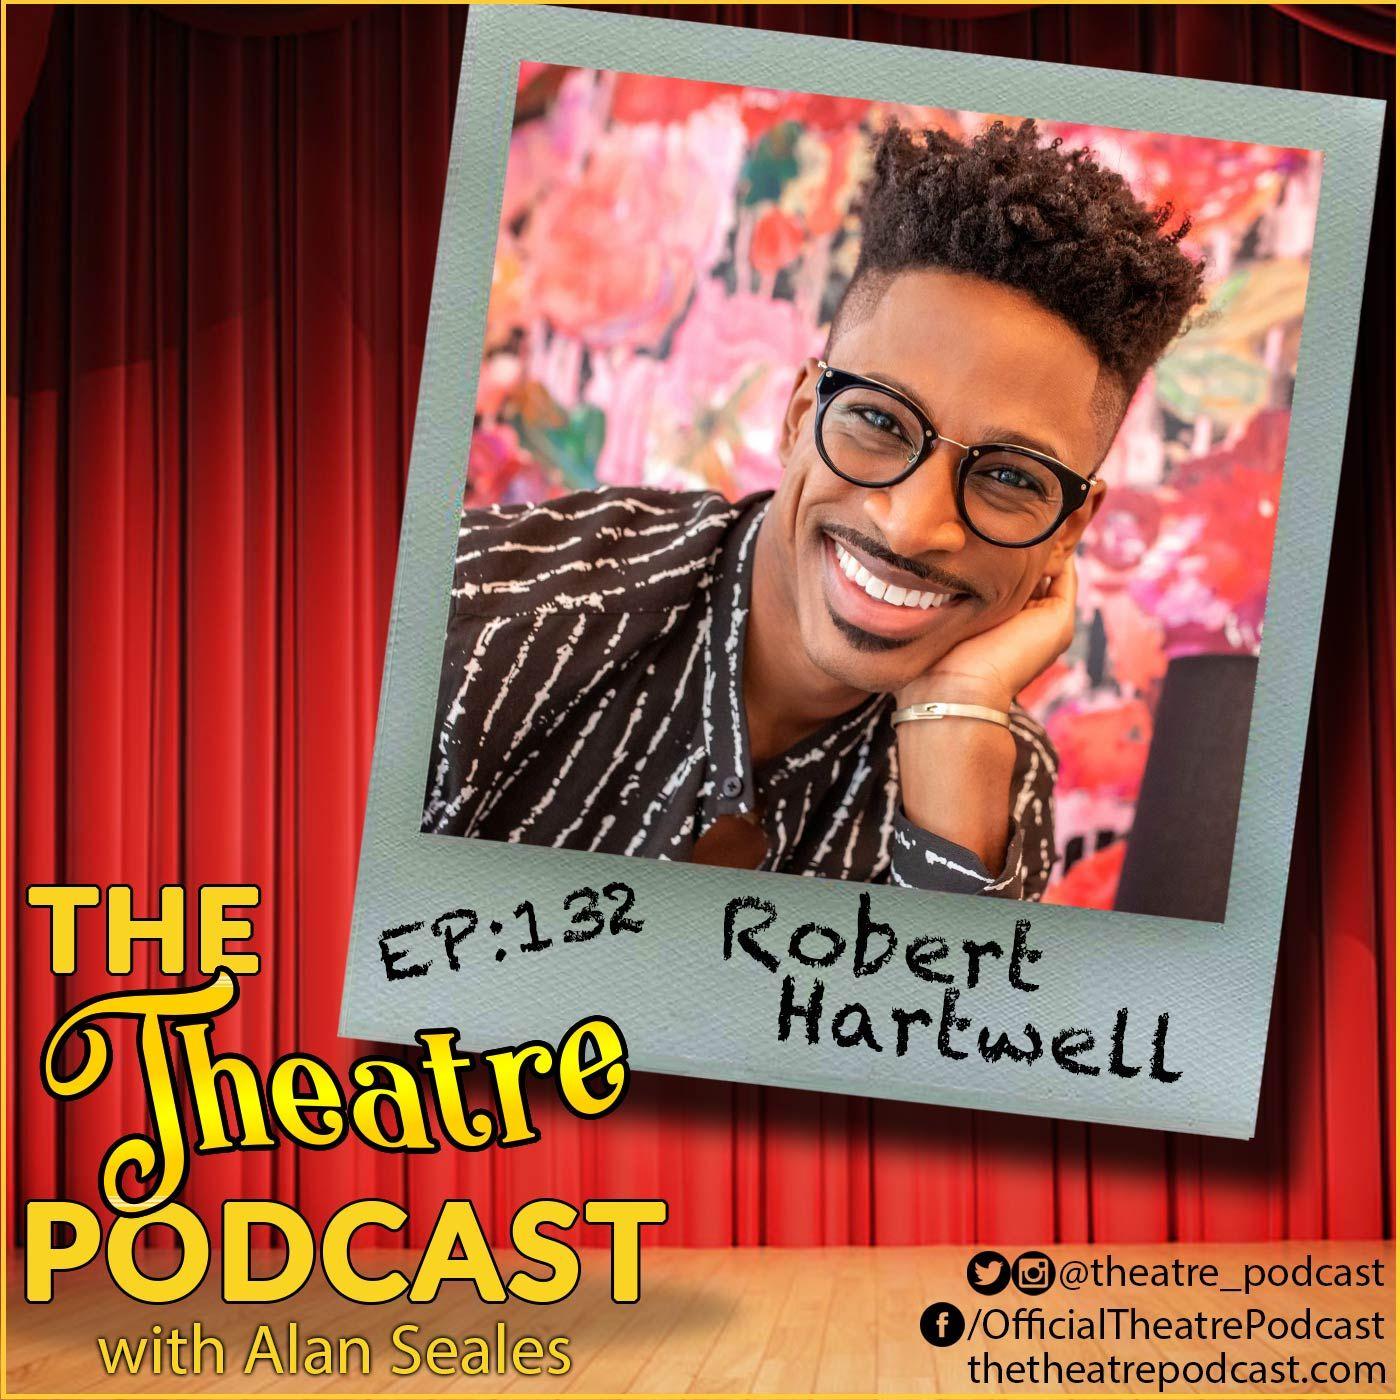 Ep132 - Robert Hartwell: 5x Broadway Triple Threat Turned Education Leader